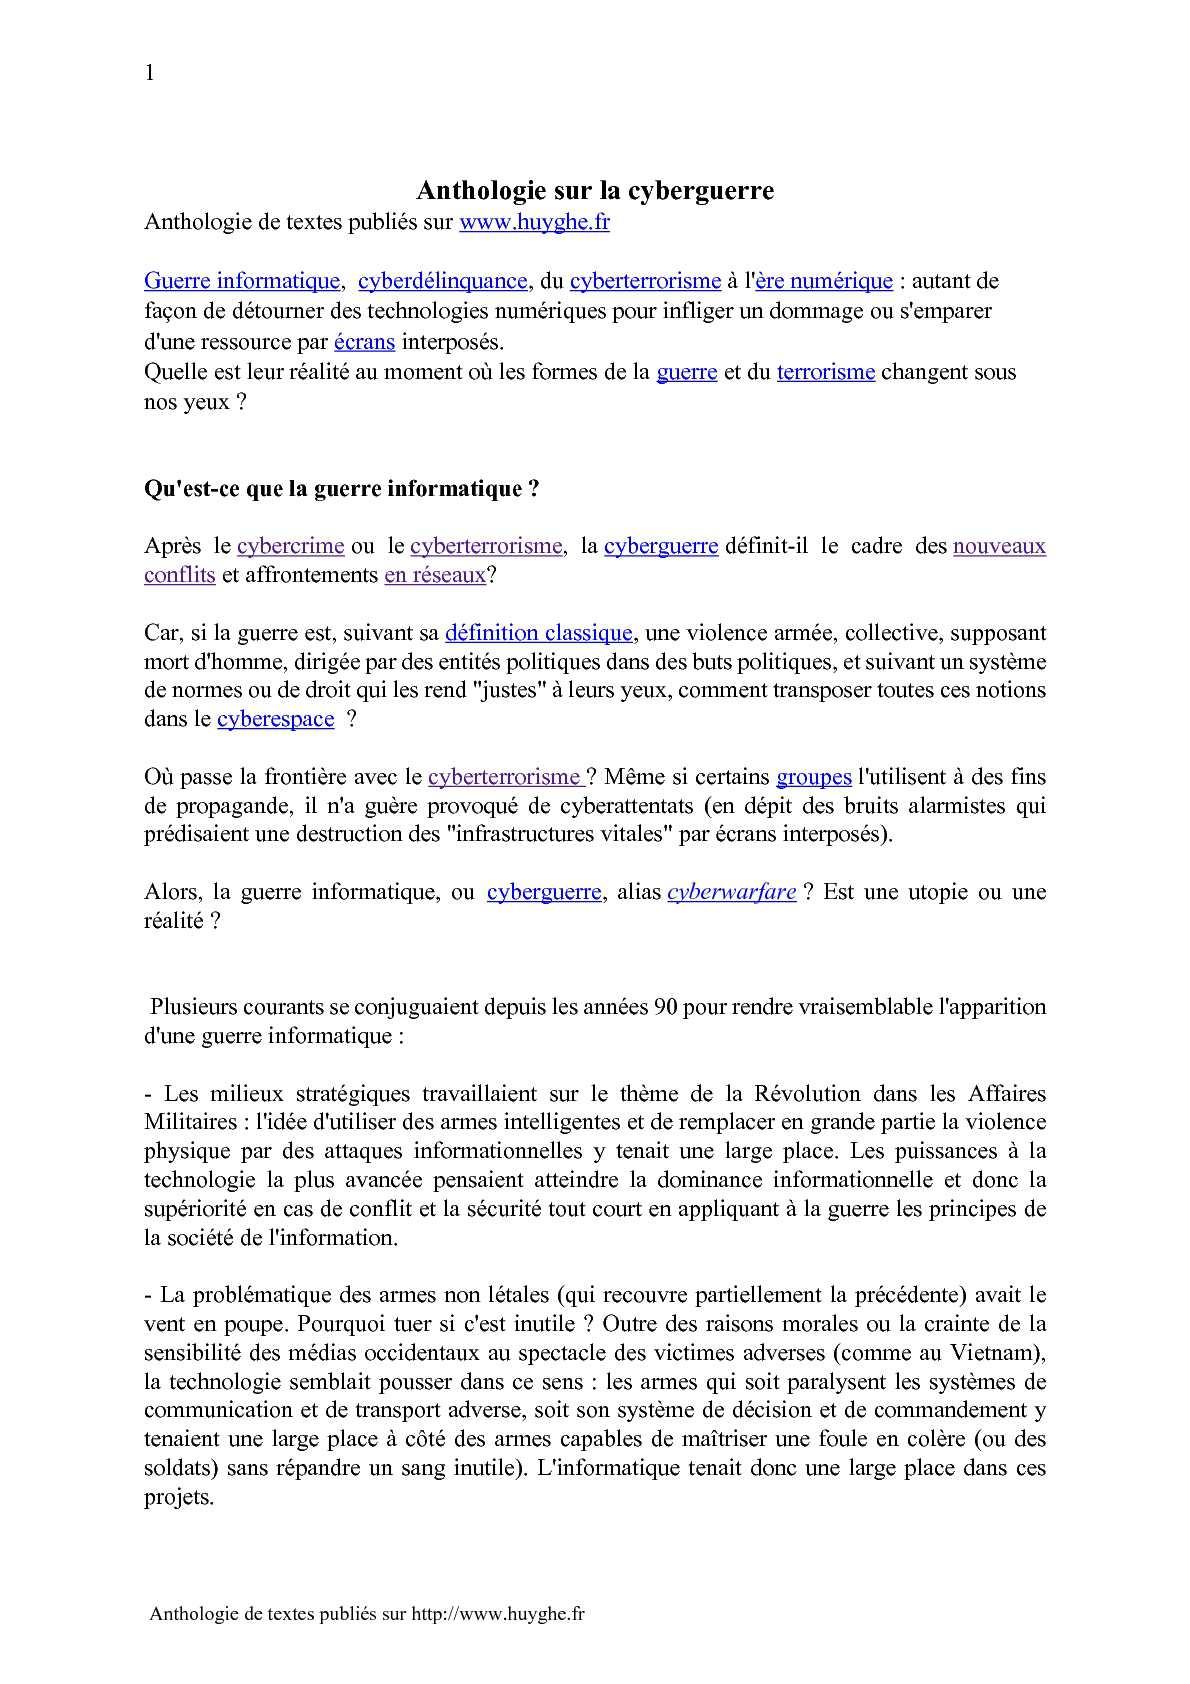 Cyberattaques : guerre, crime, terrorisme sur www.huyghe.fr